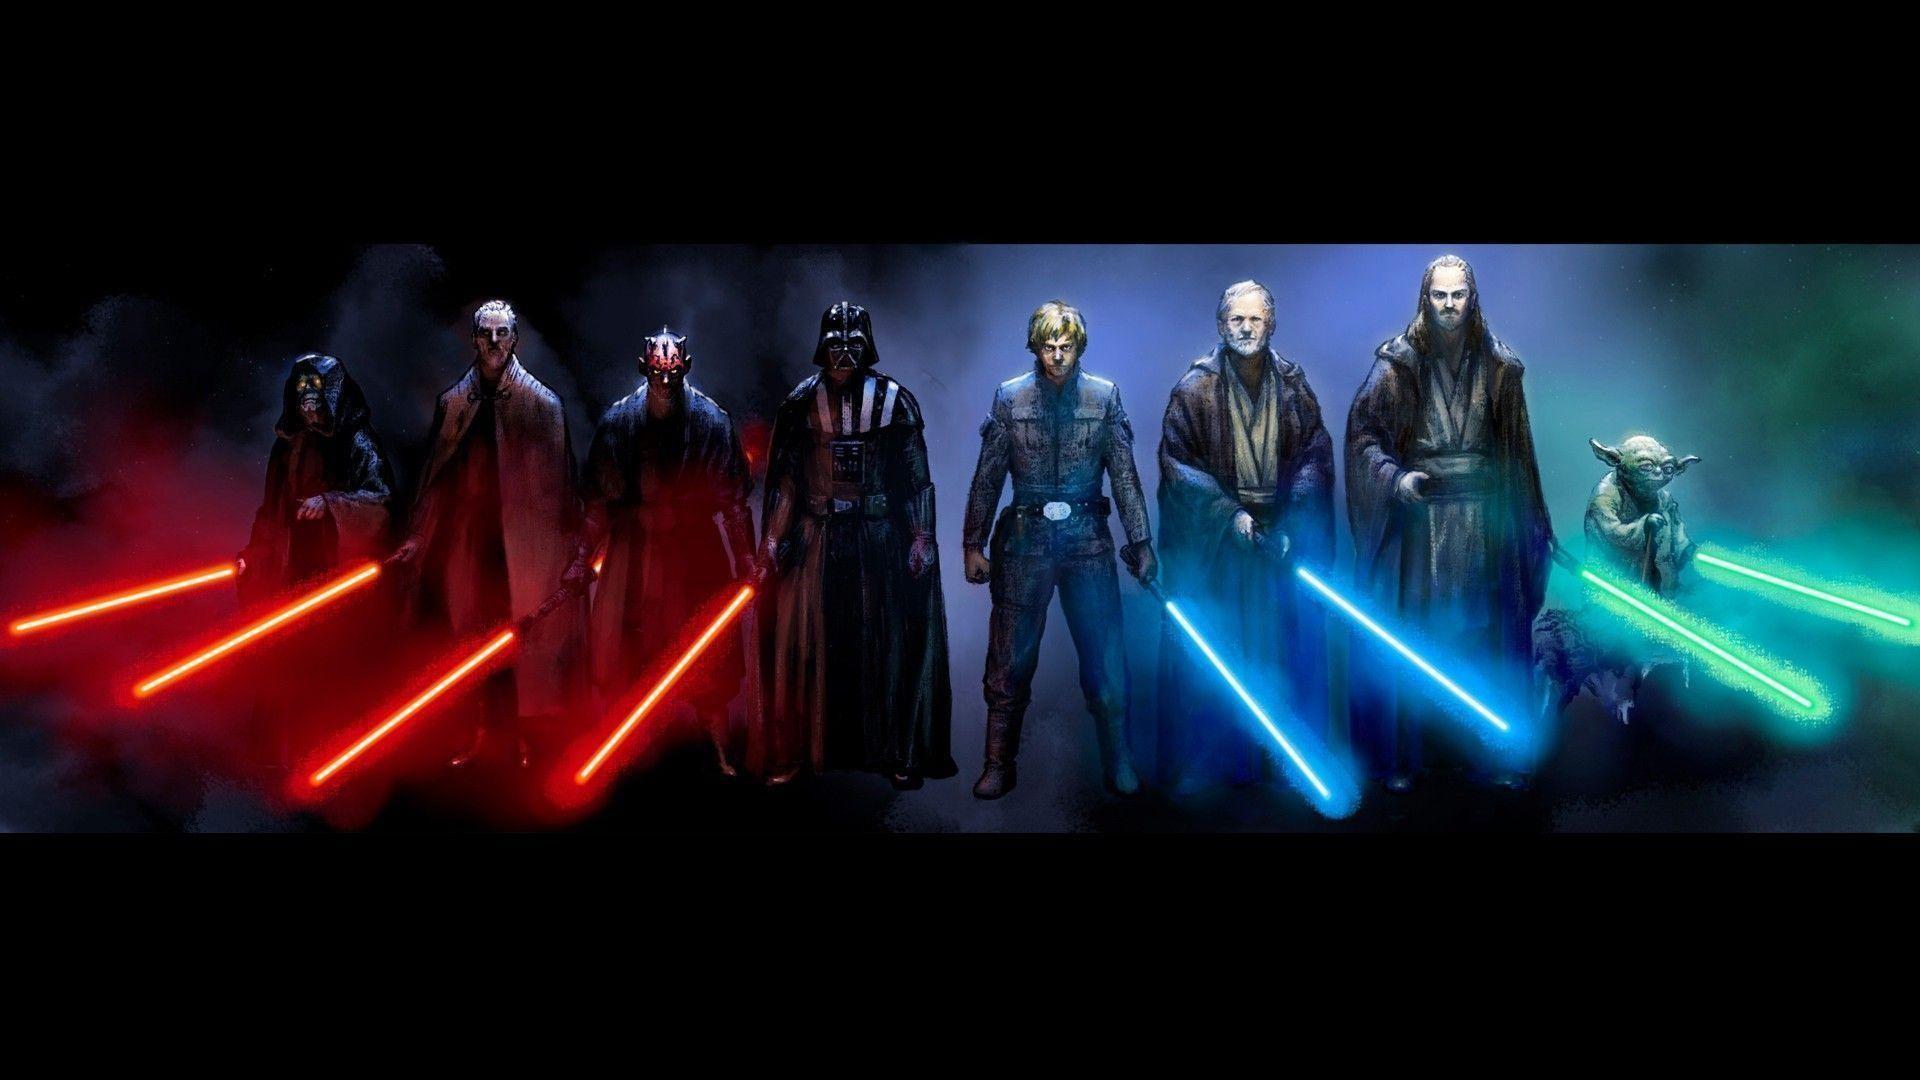 Star Wars Sith wallpaper – 1243429